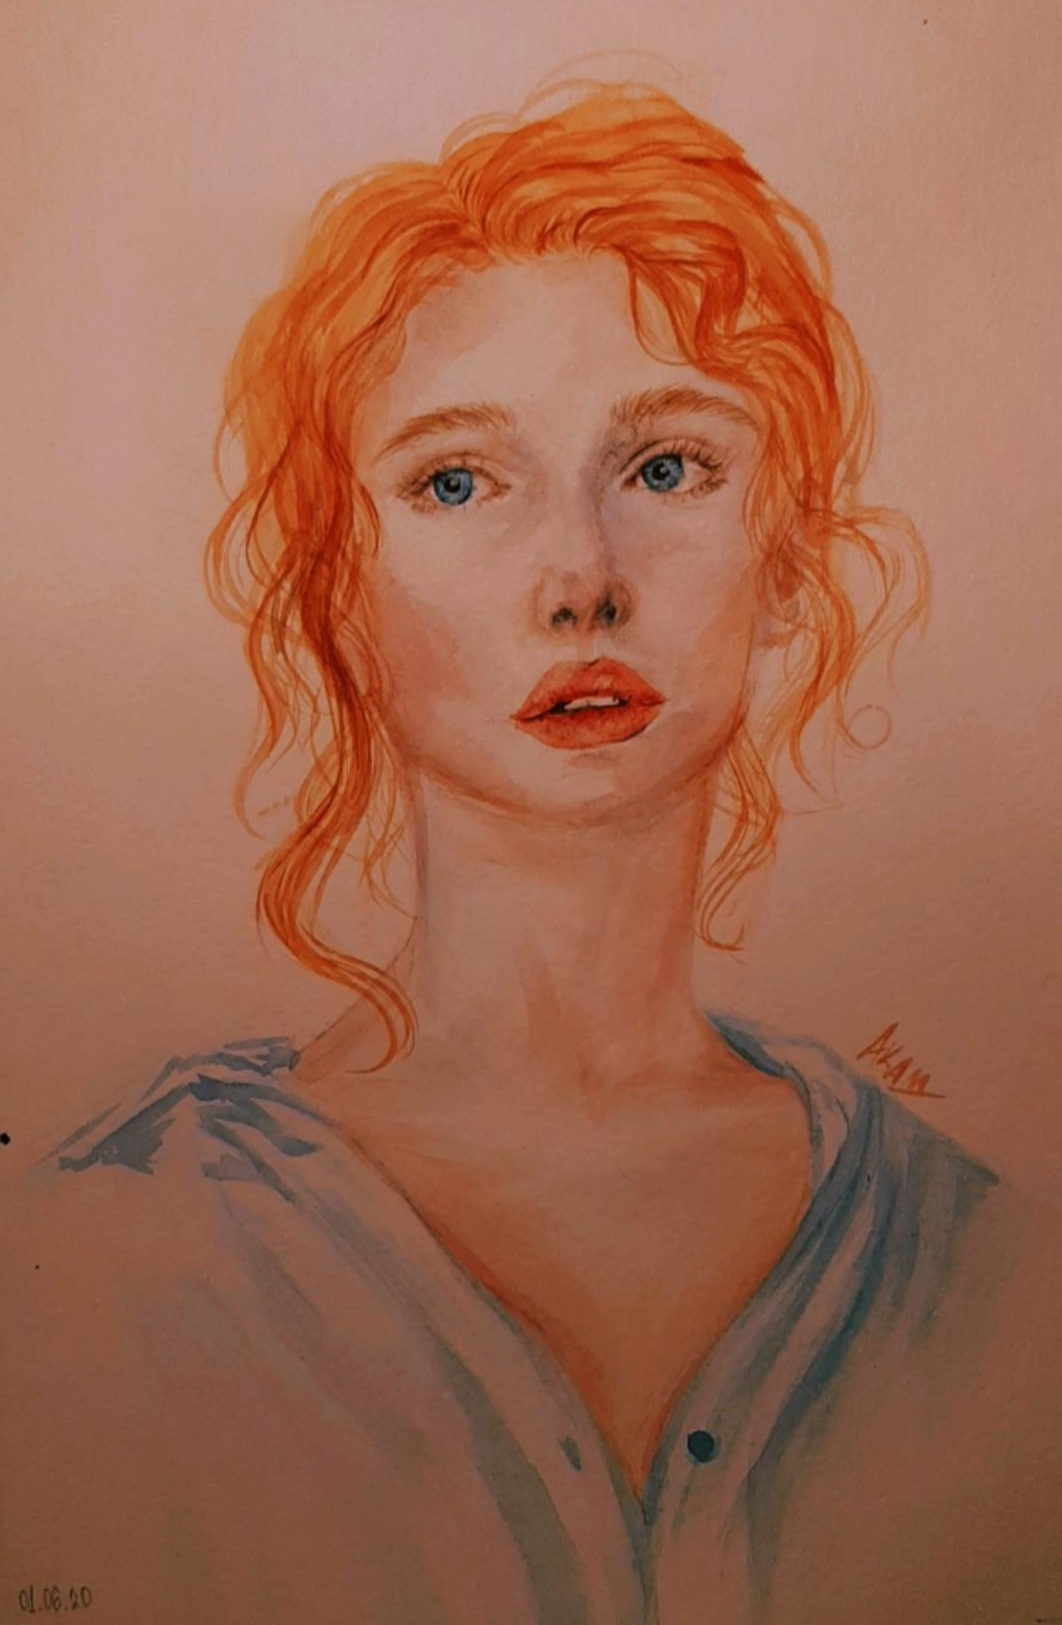 Camilla Ilmirovna Galimova. Fiery